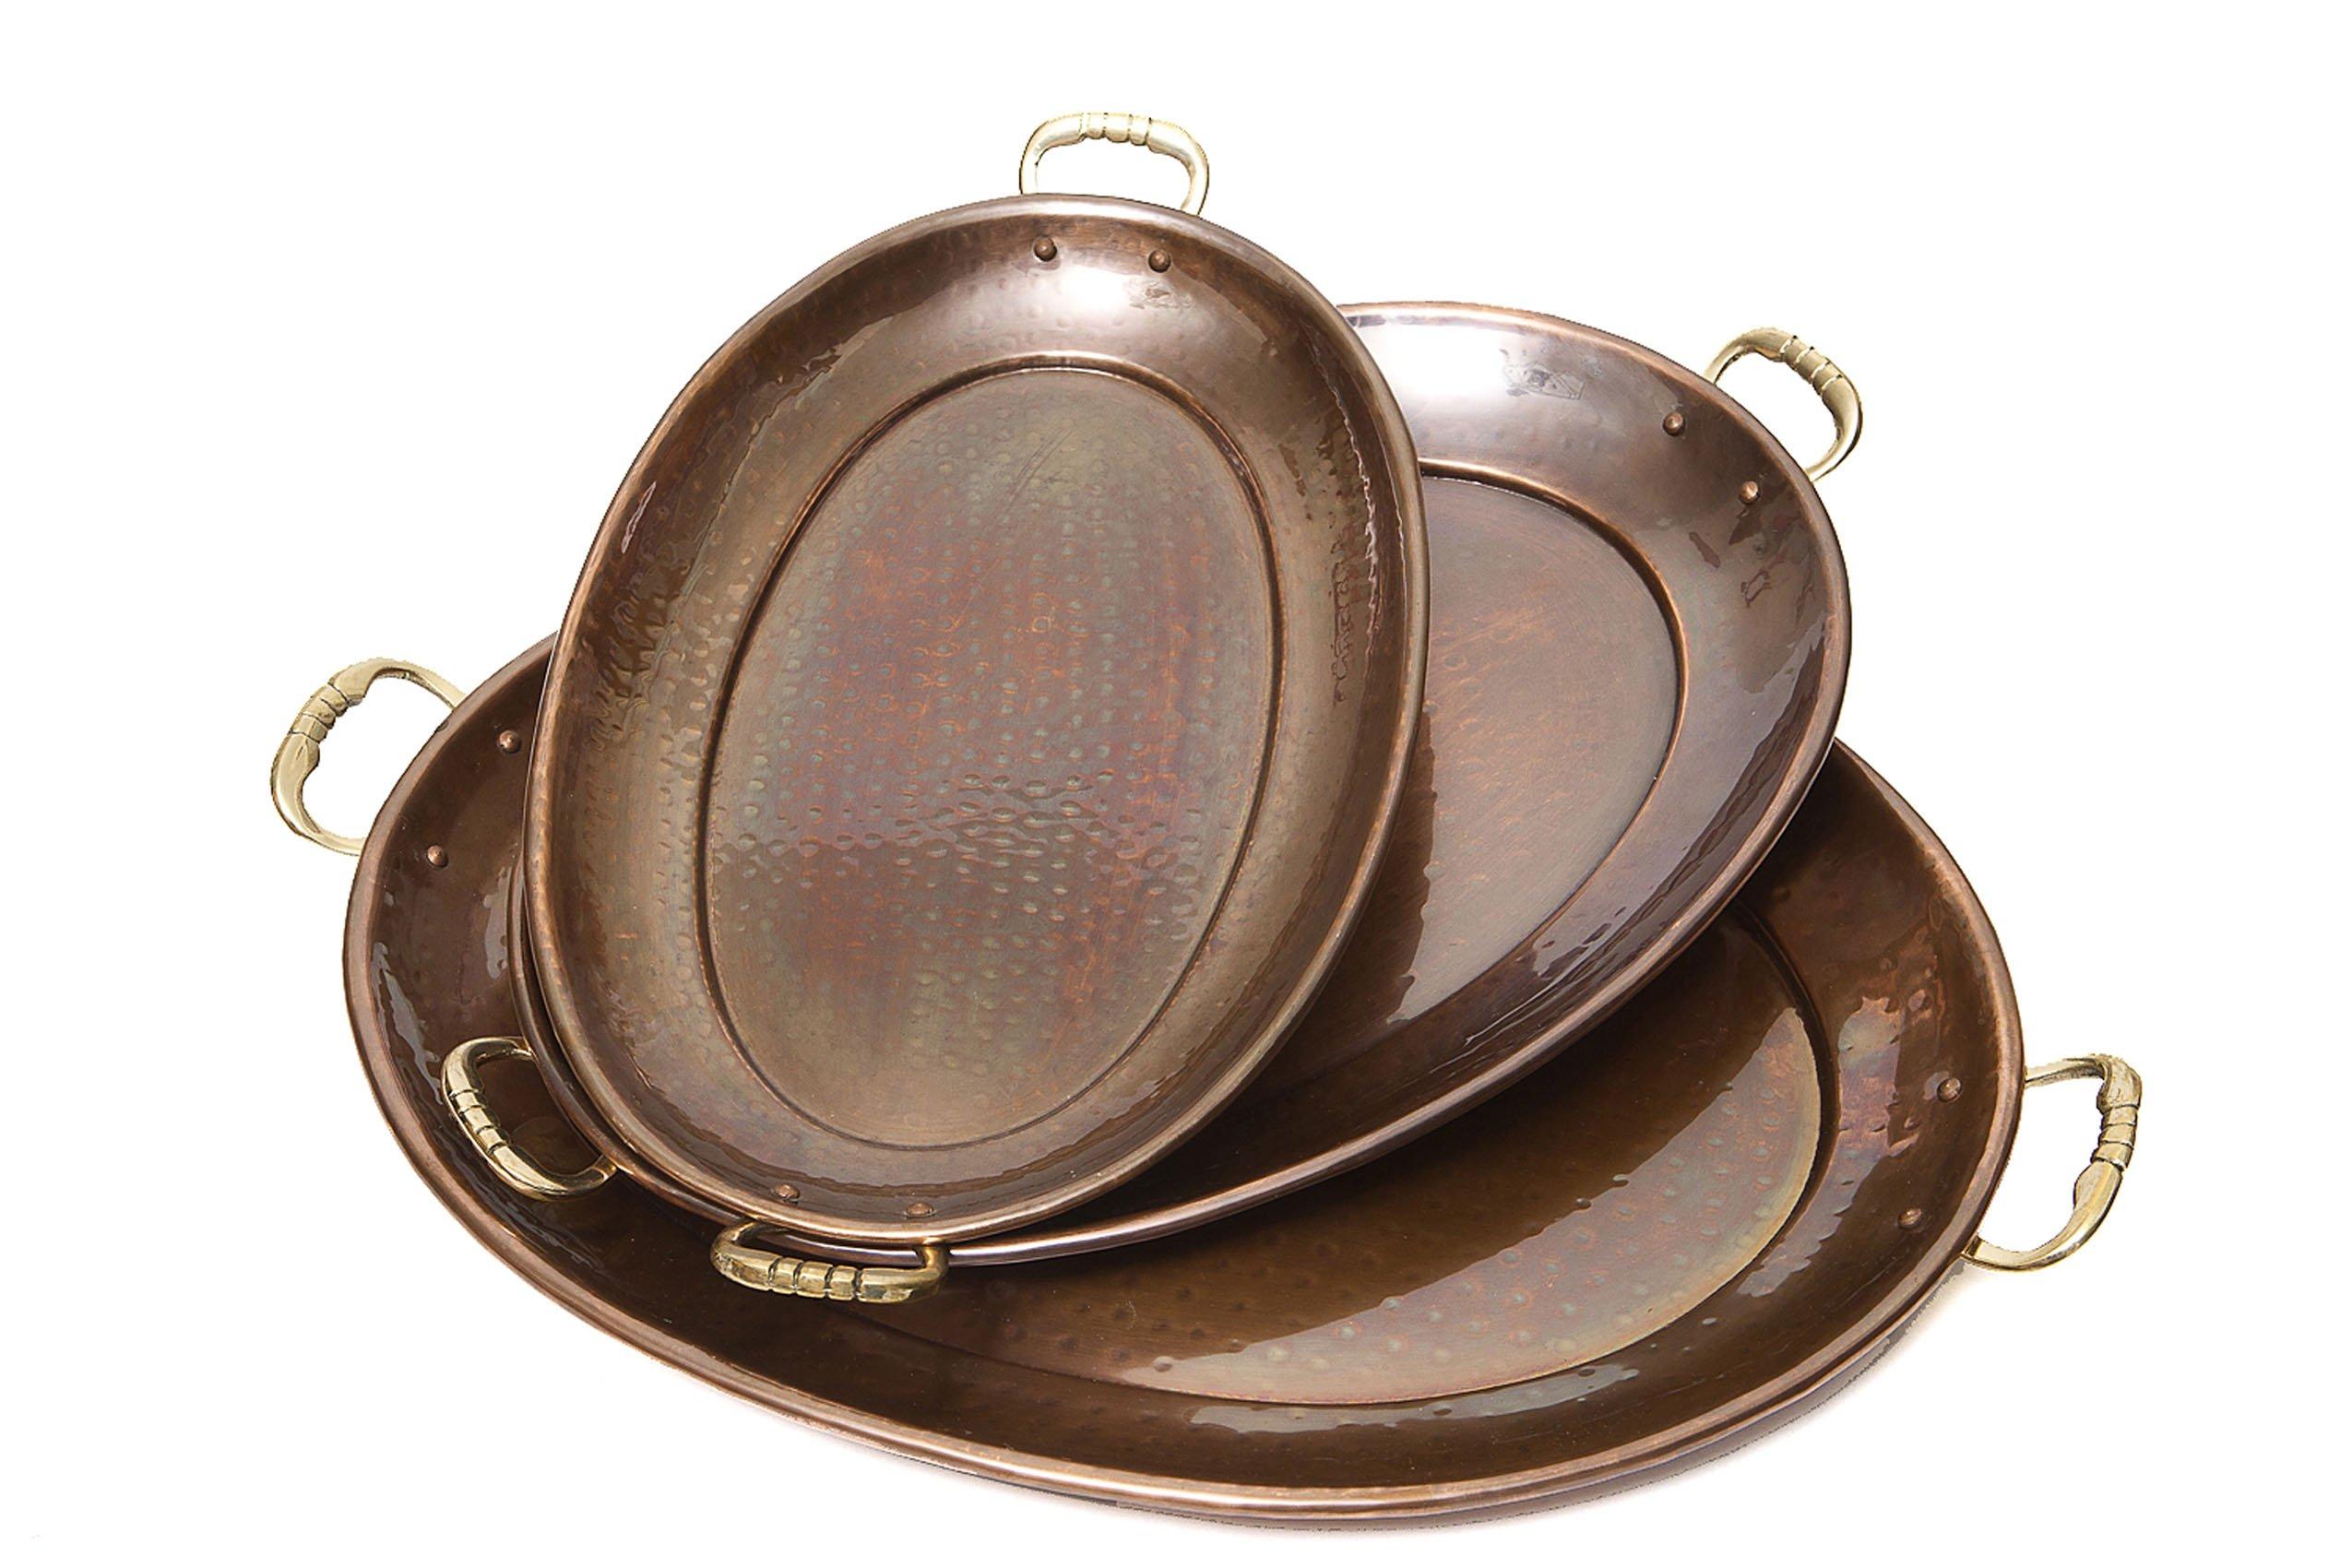 Old Dutch Decor Antique Copper Oval Tray, 17-Inch by 13-Inch, 15-Inch by 11-Inch and 13-1/4-Inch by 8-3/4-Inch, Set of 3